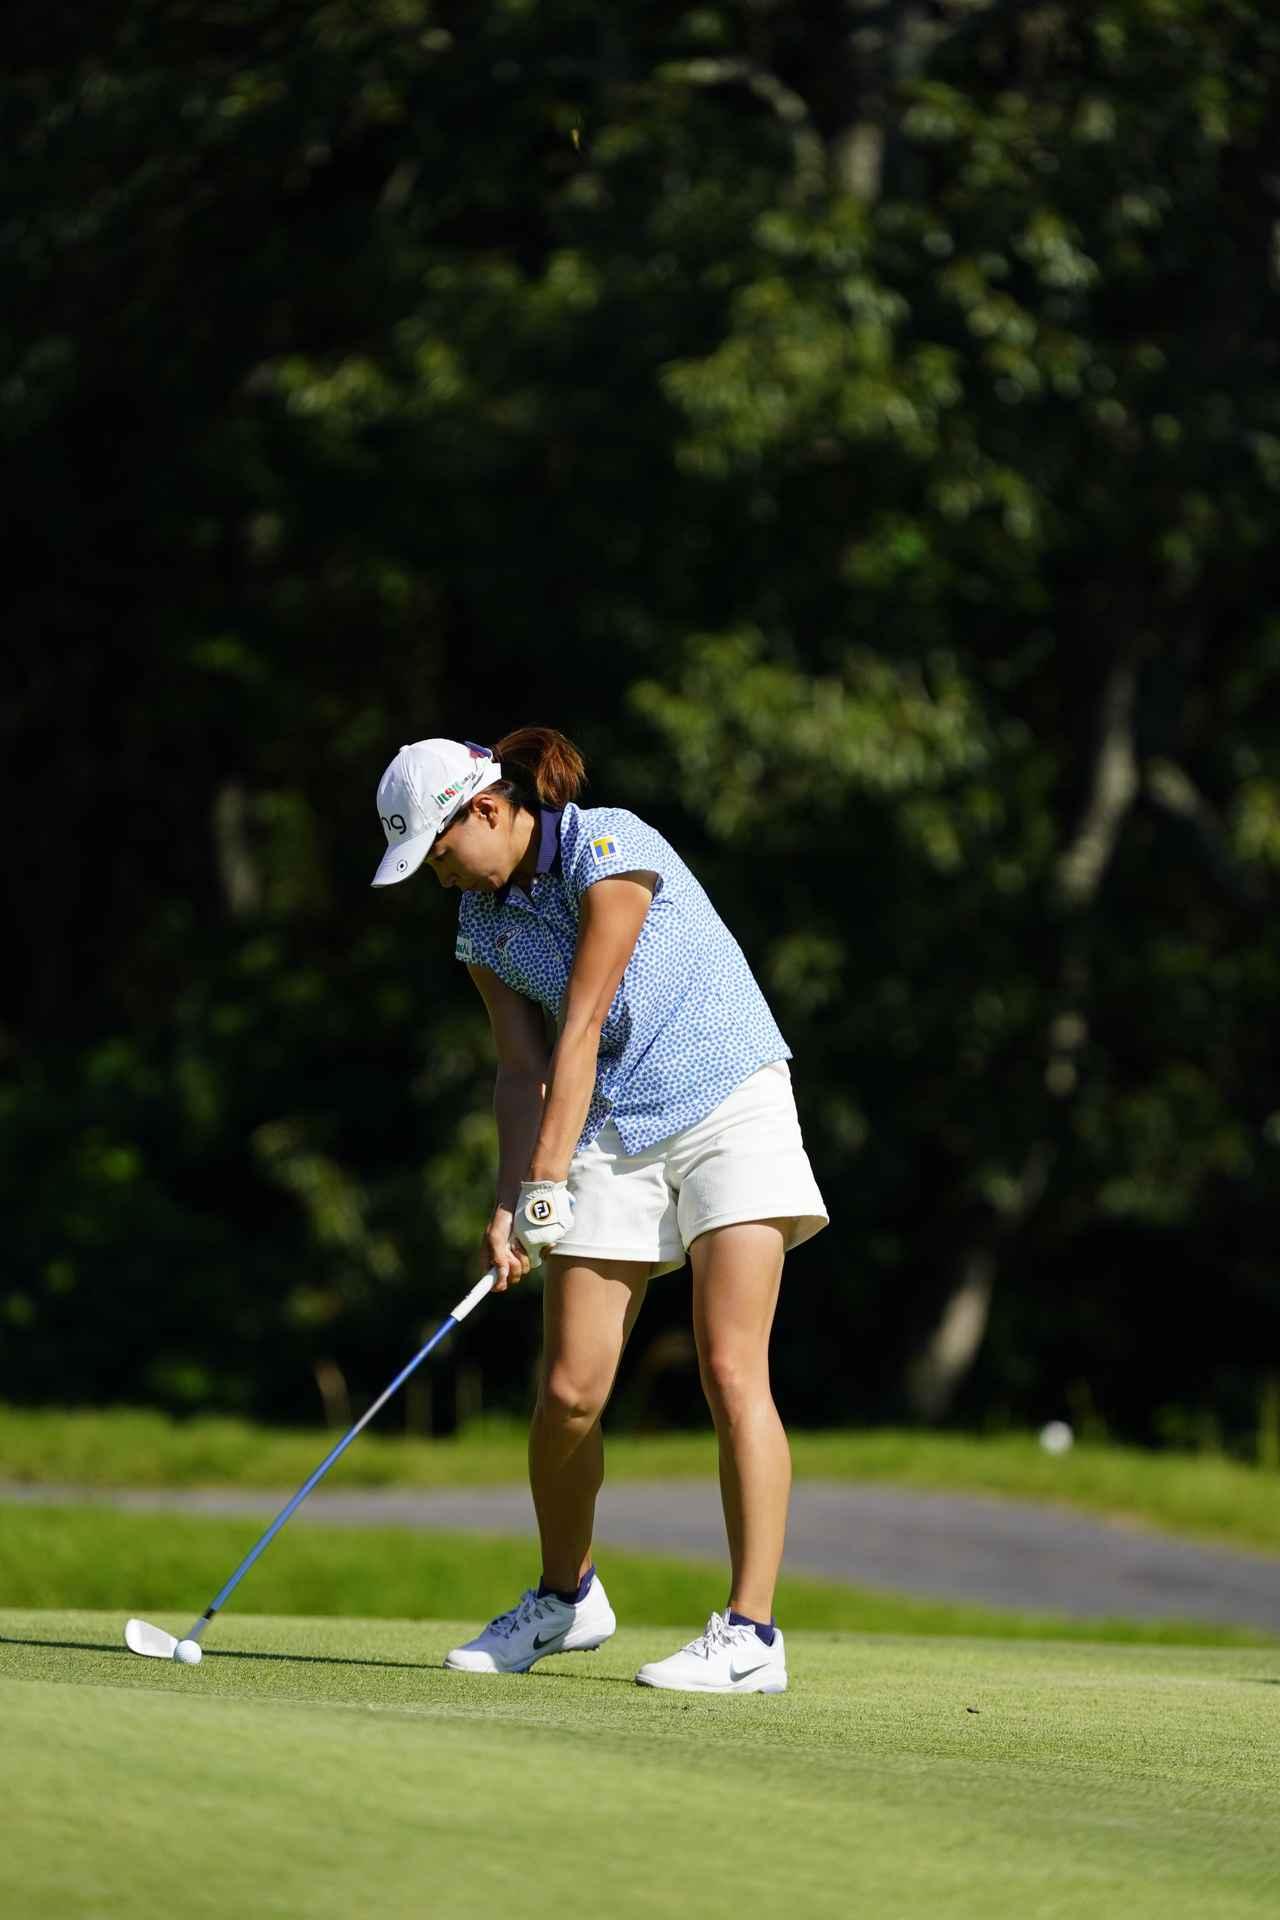 Images : 14番目の画像 - 渋野日向子 アイアン連続写真 - みんなのゴルフダイジェスト